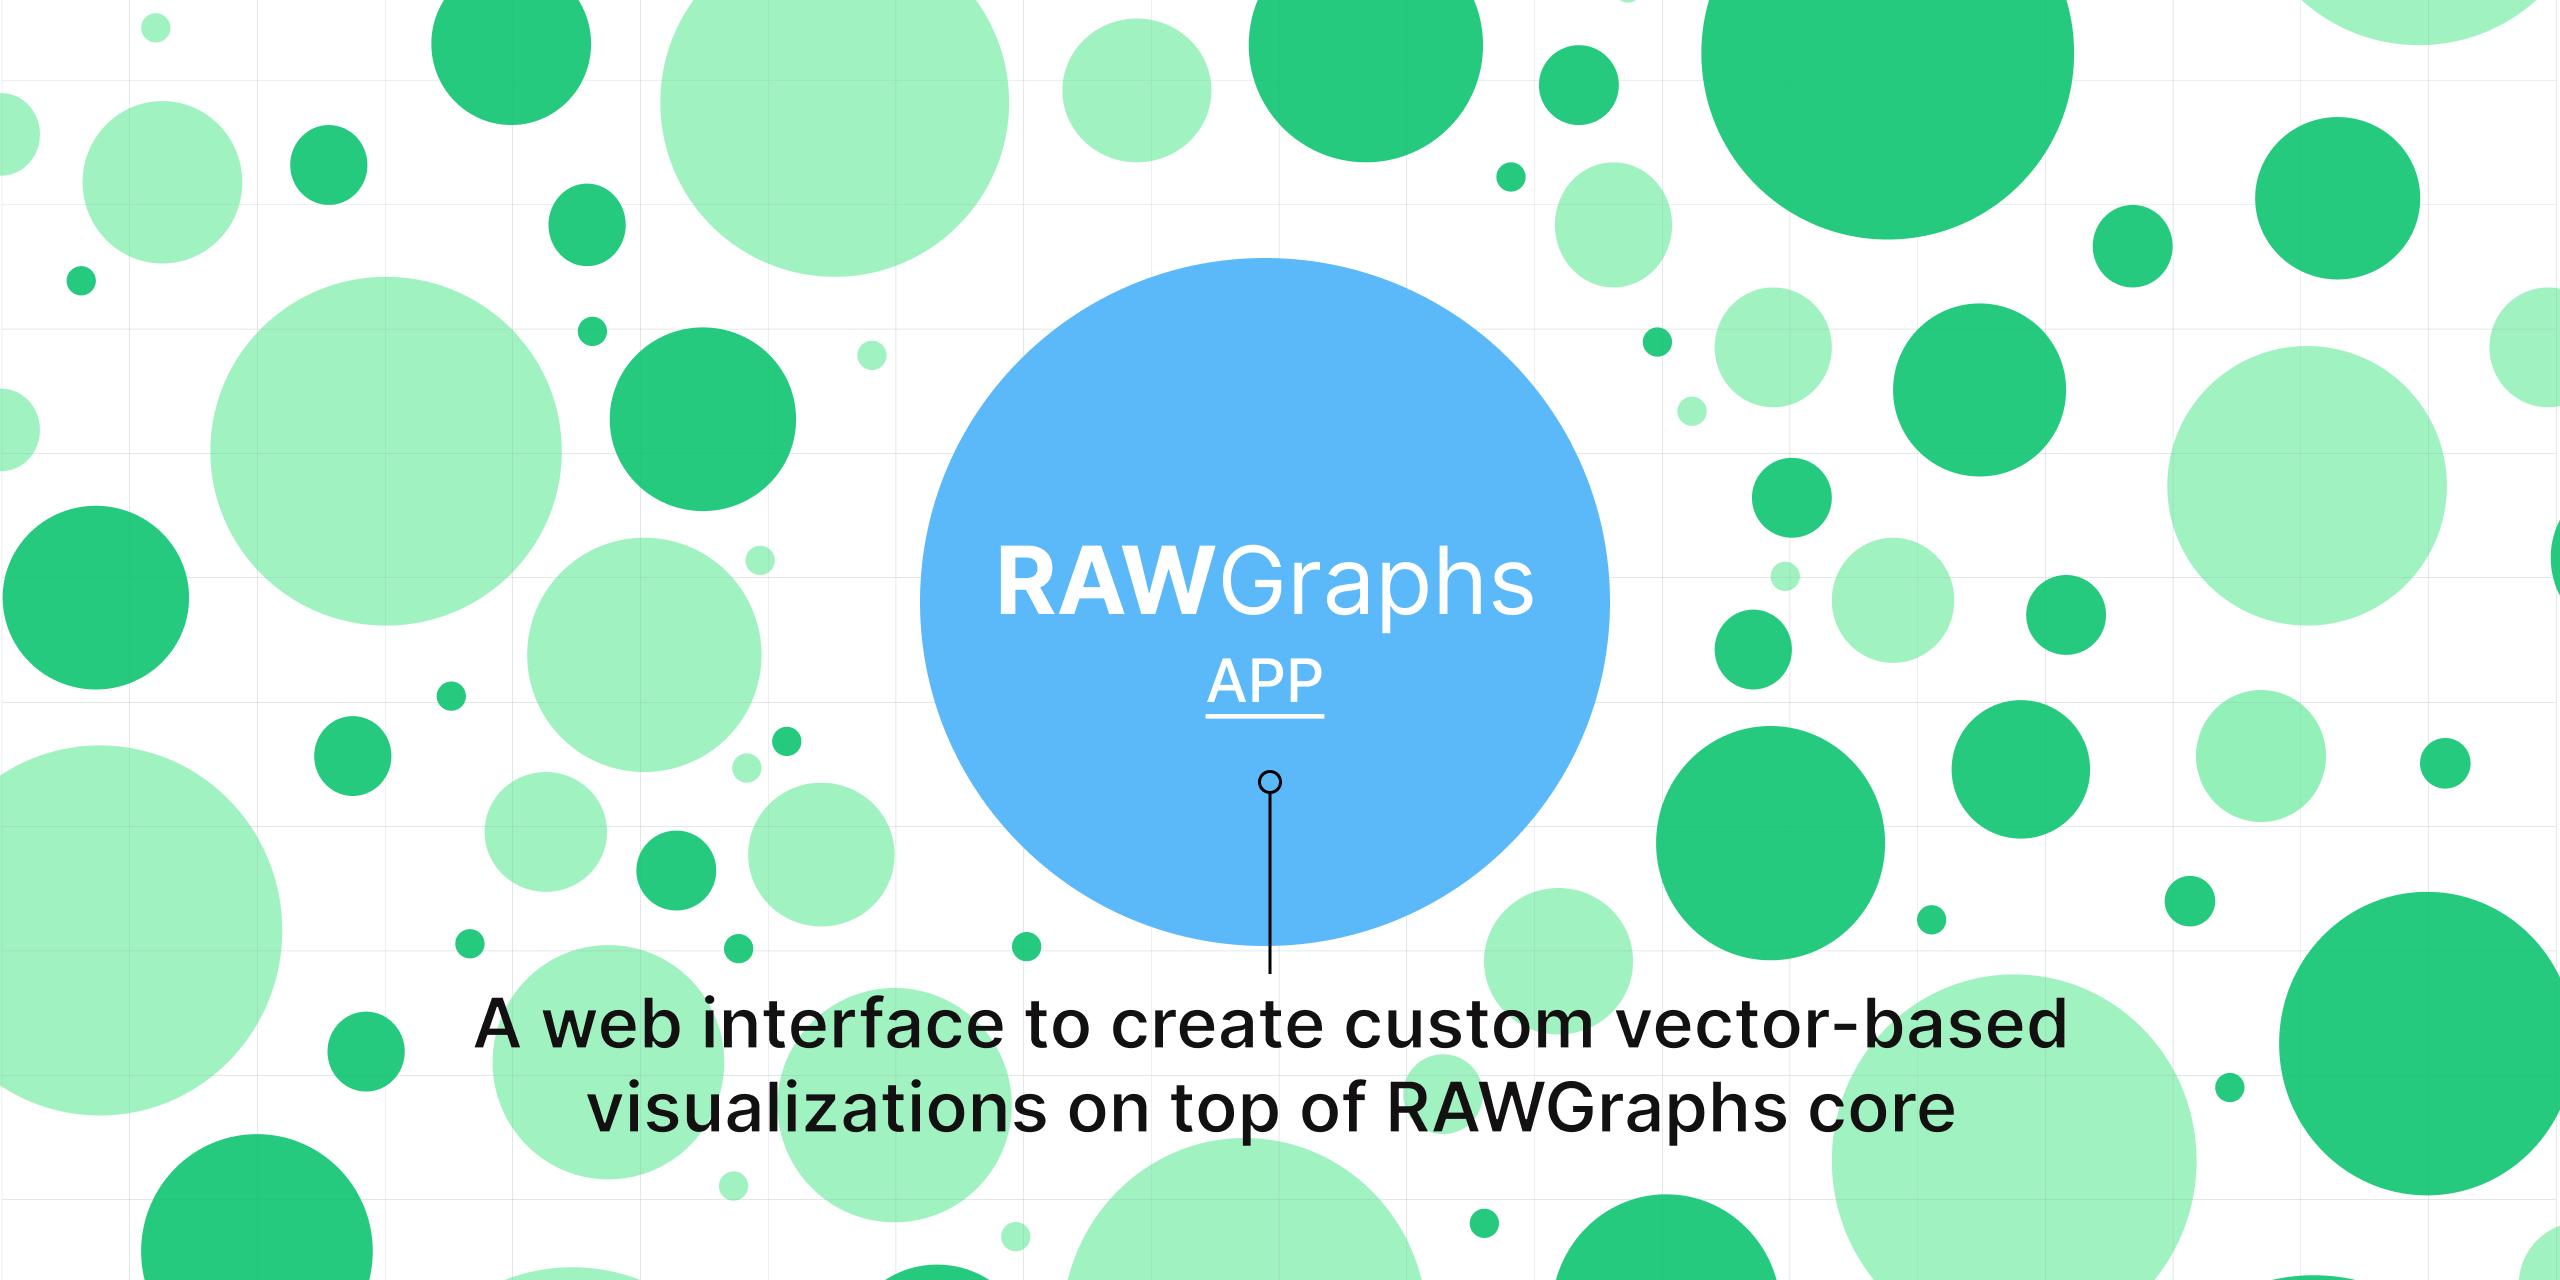 rawgraphs-app